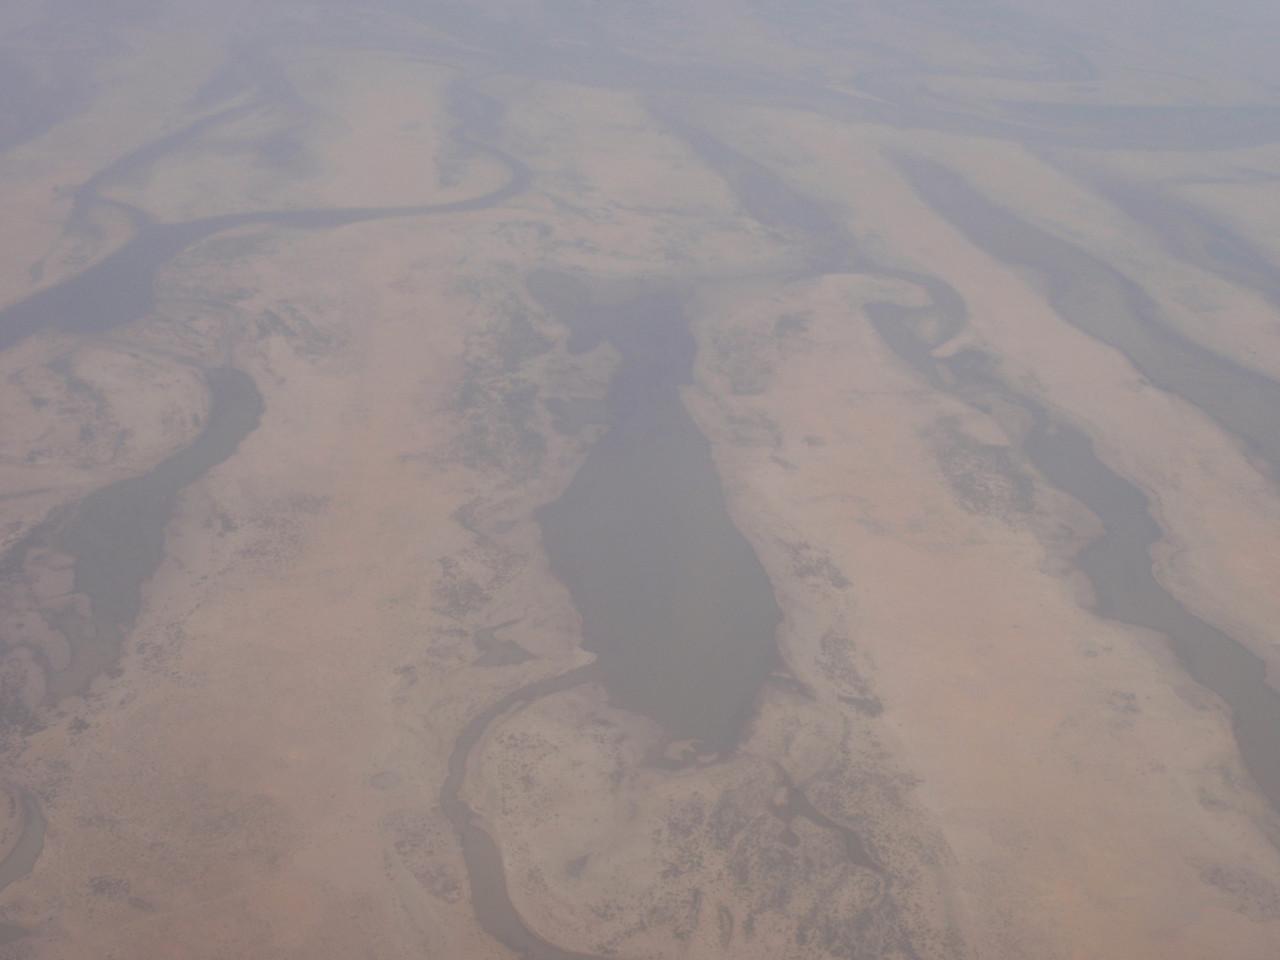 019_From the Dry Sahel Belt to the Unforgiving Sahara